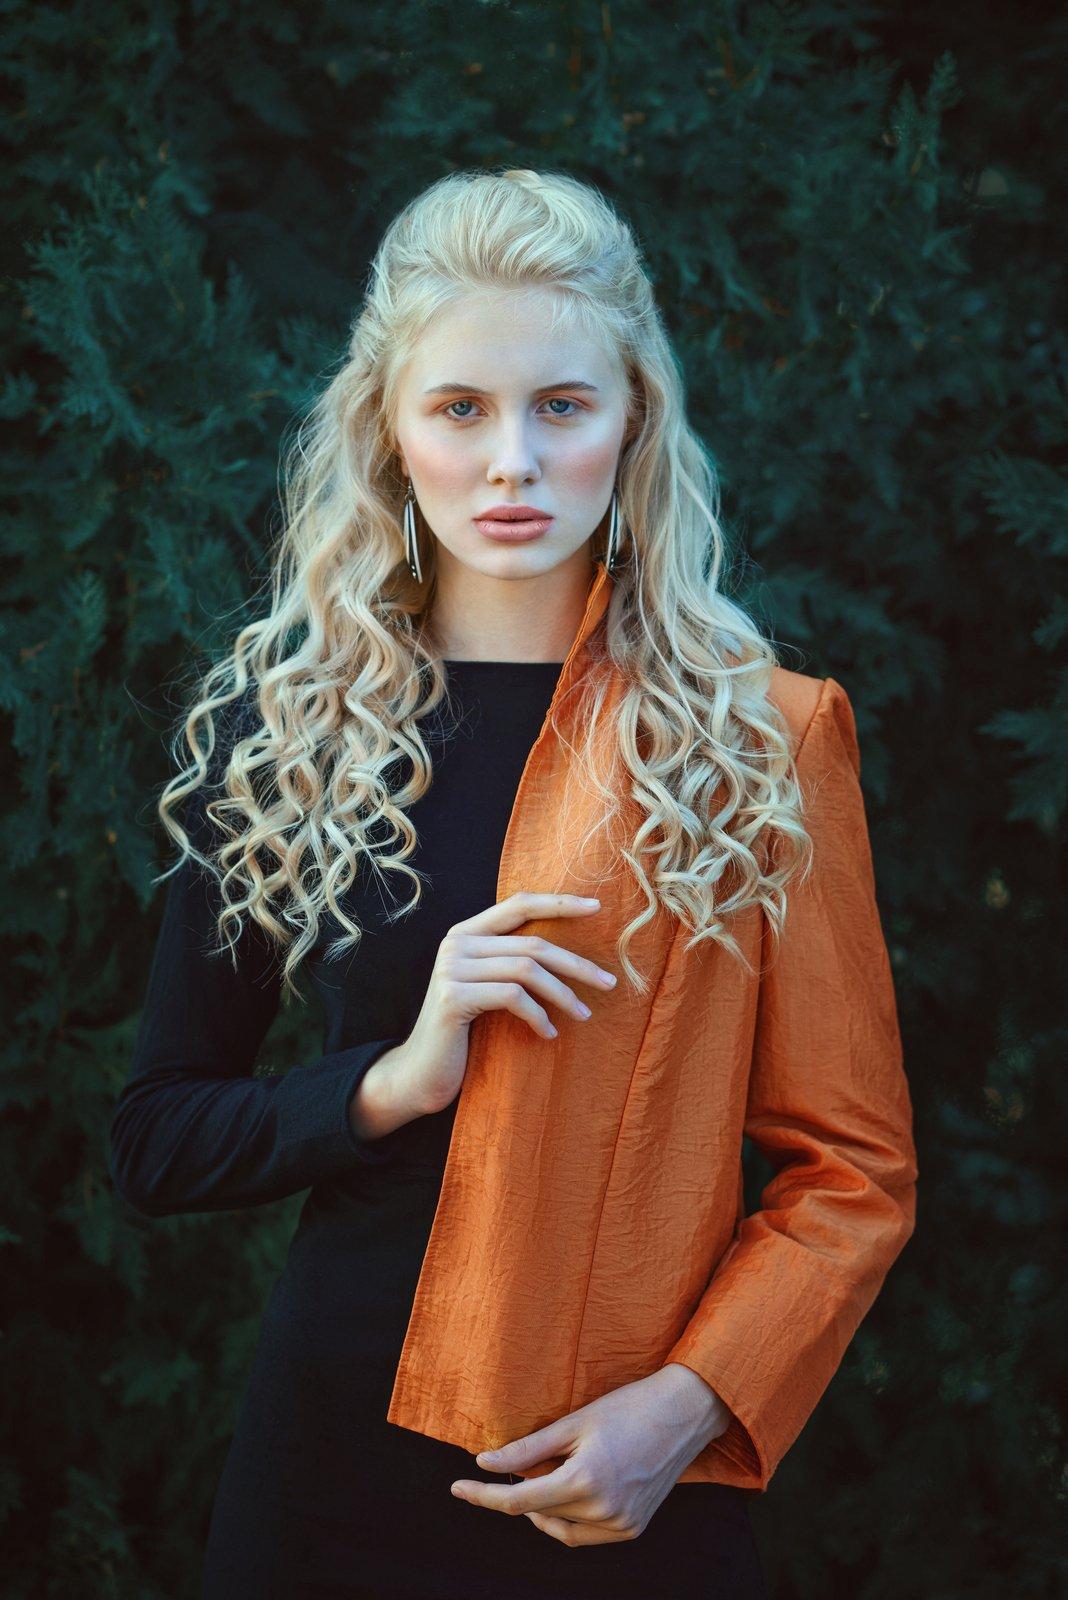 portrait, girl, model, eyes, hair, lips, face, beauty, facial, make-up, photographer, russia, nikon, Дегтярёва Анна